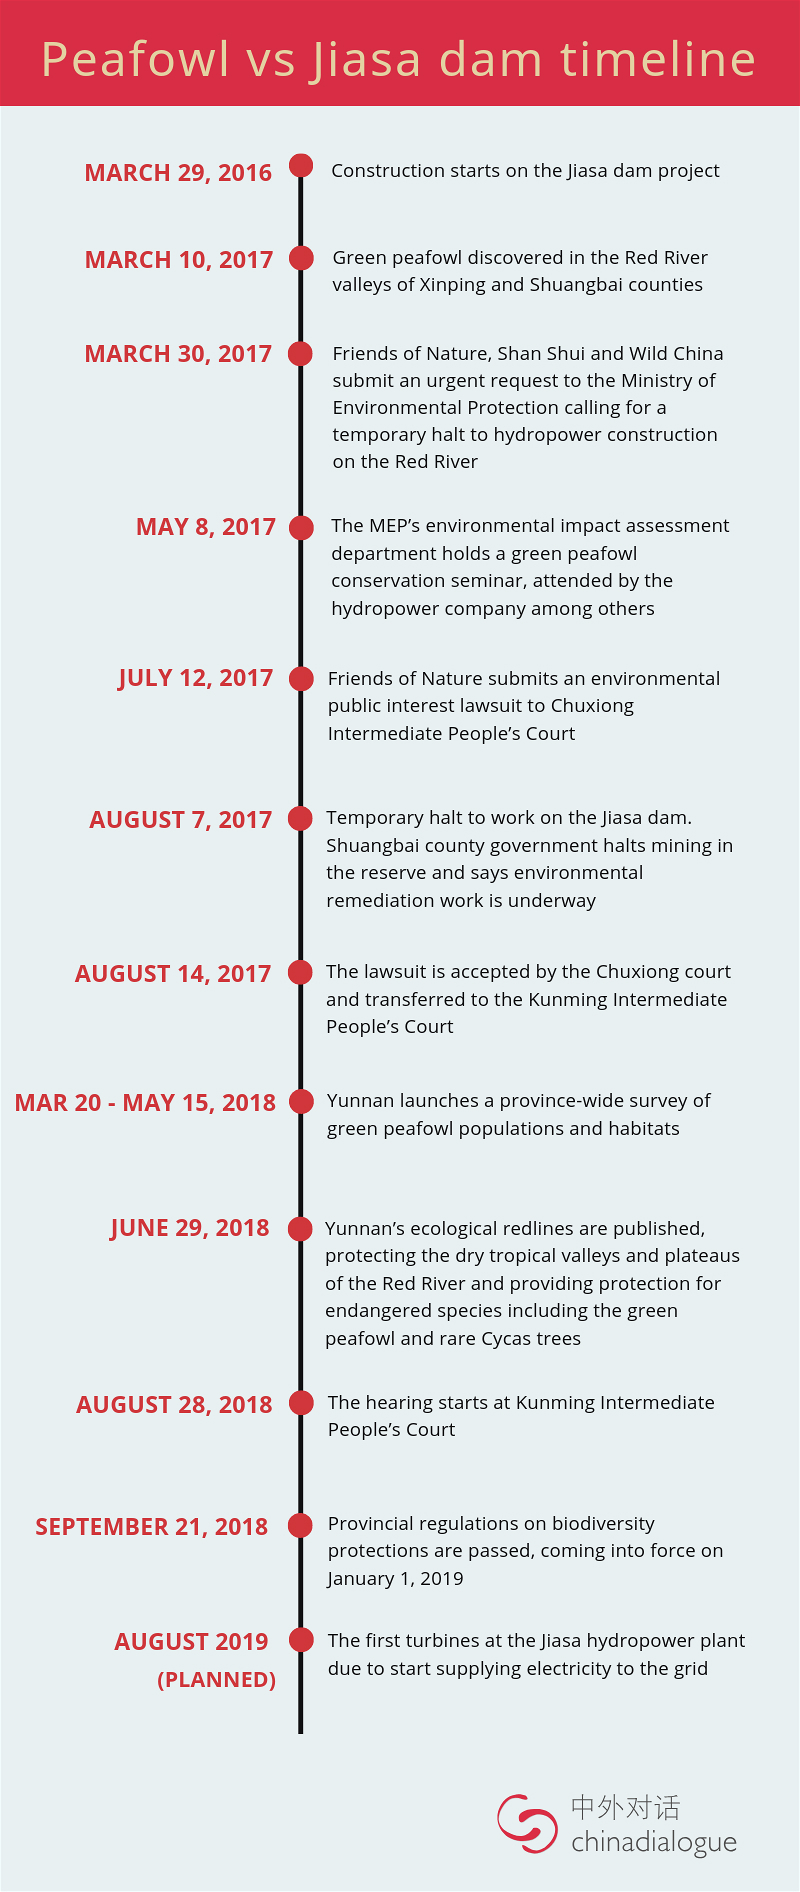 Peafowl vs Jiasha dam timeline